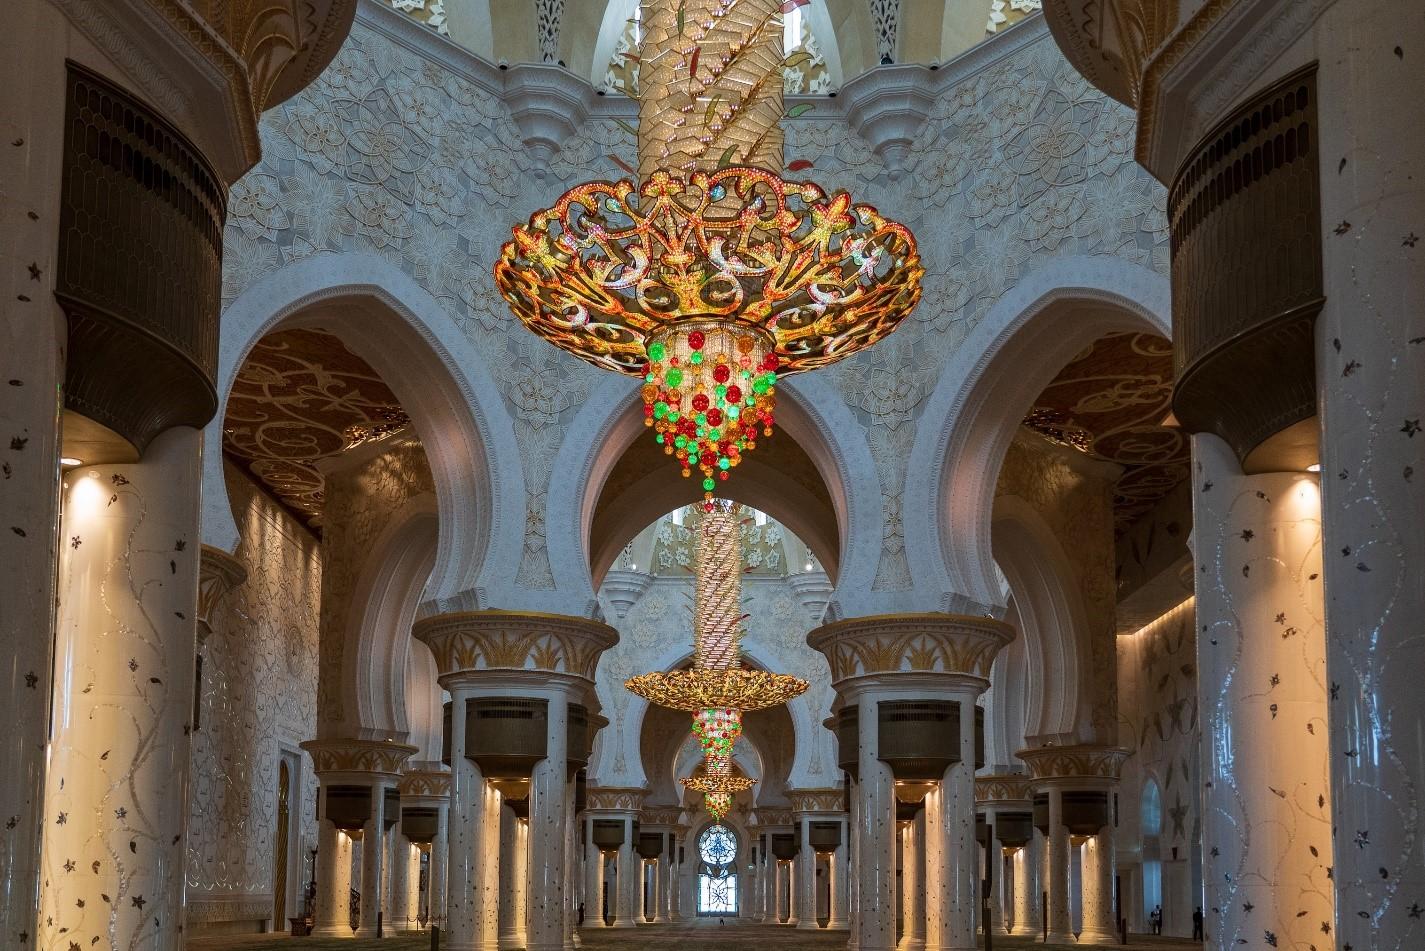 Islamic style in interior design – Islamic Inspired Interiors